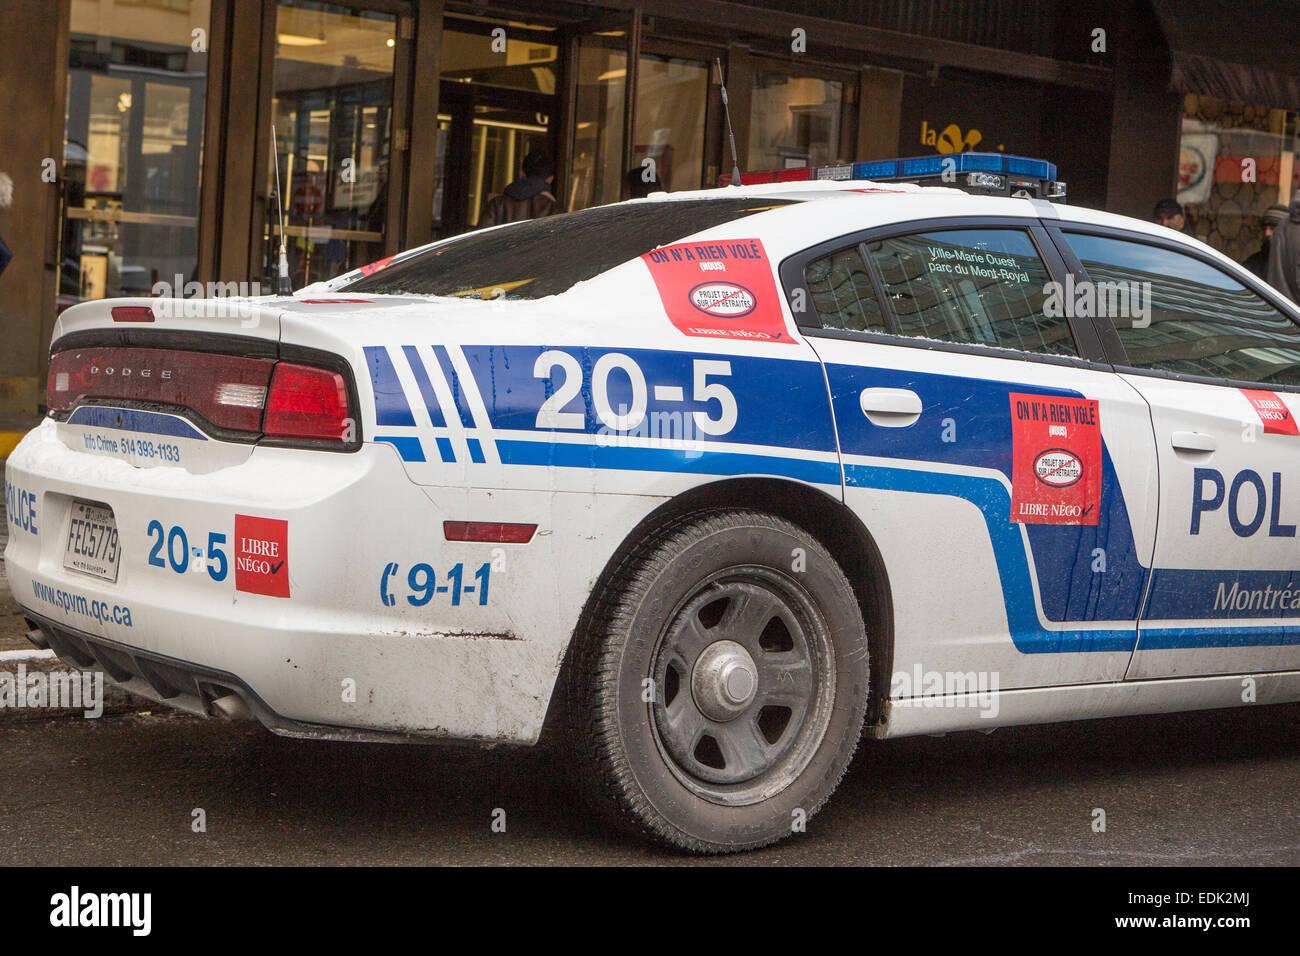 Police Car Stickers Stock Photos & Police Car Stickers Stock